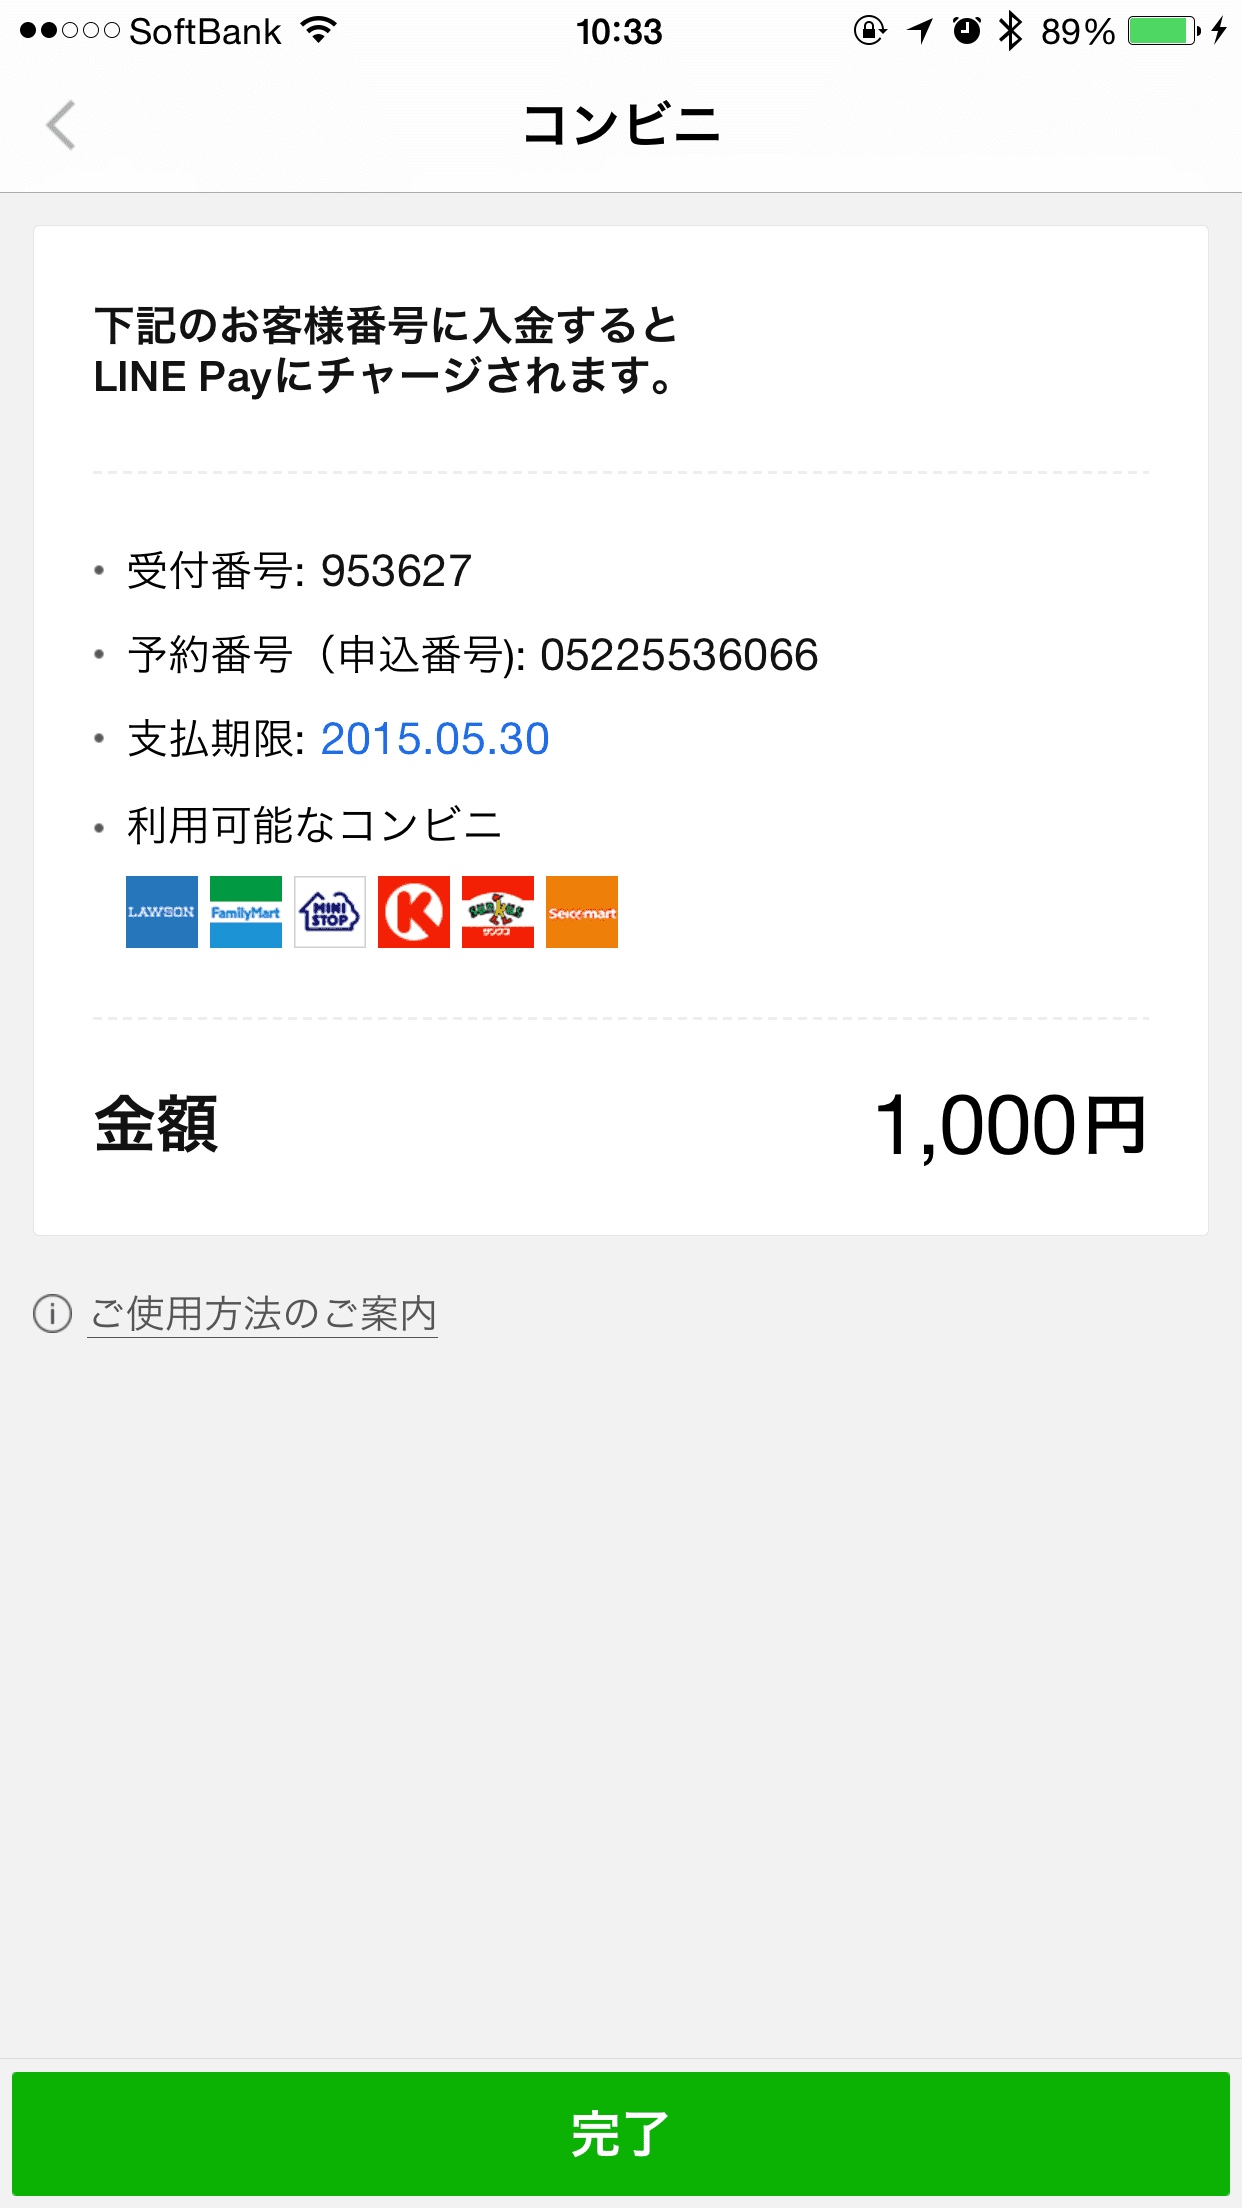 LINE Pay コンビニ チャージ